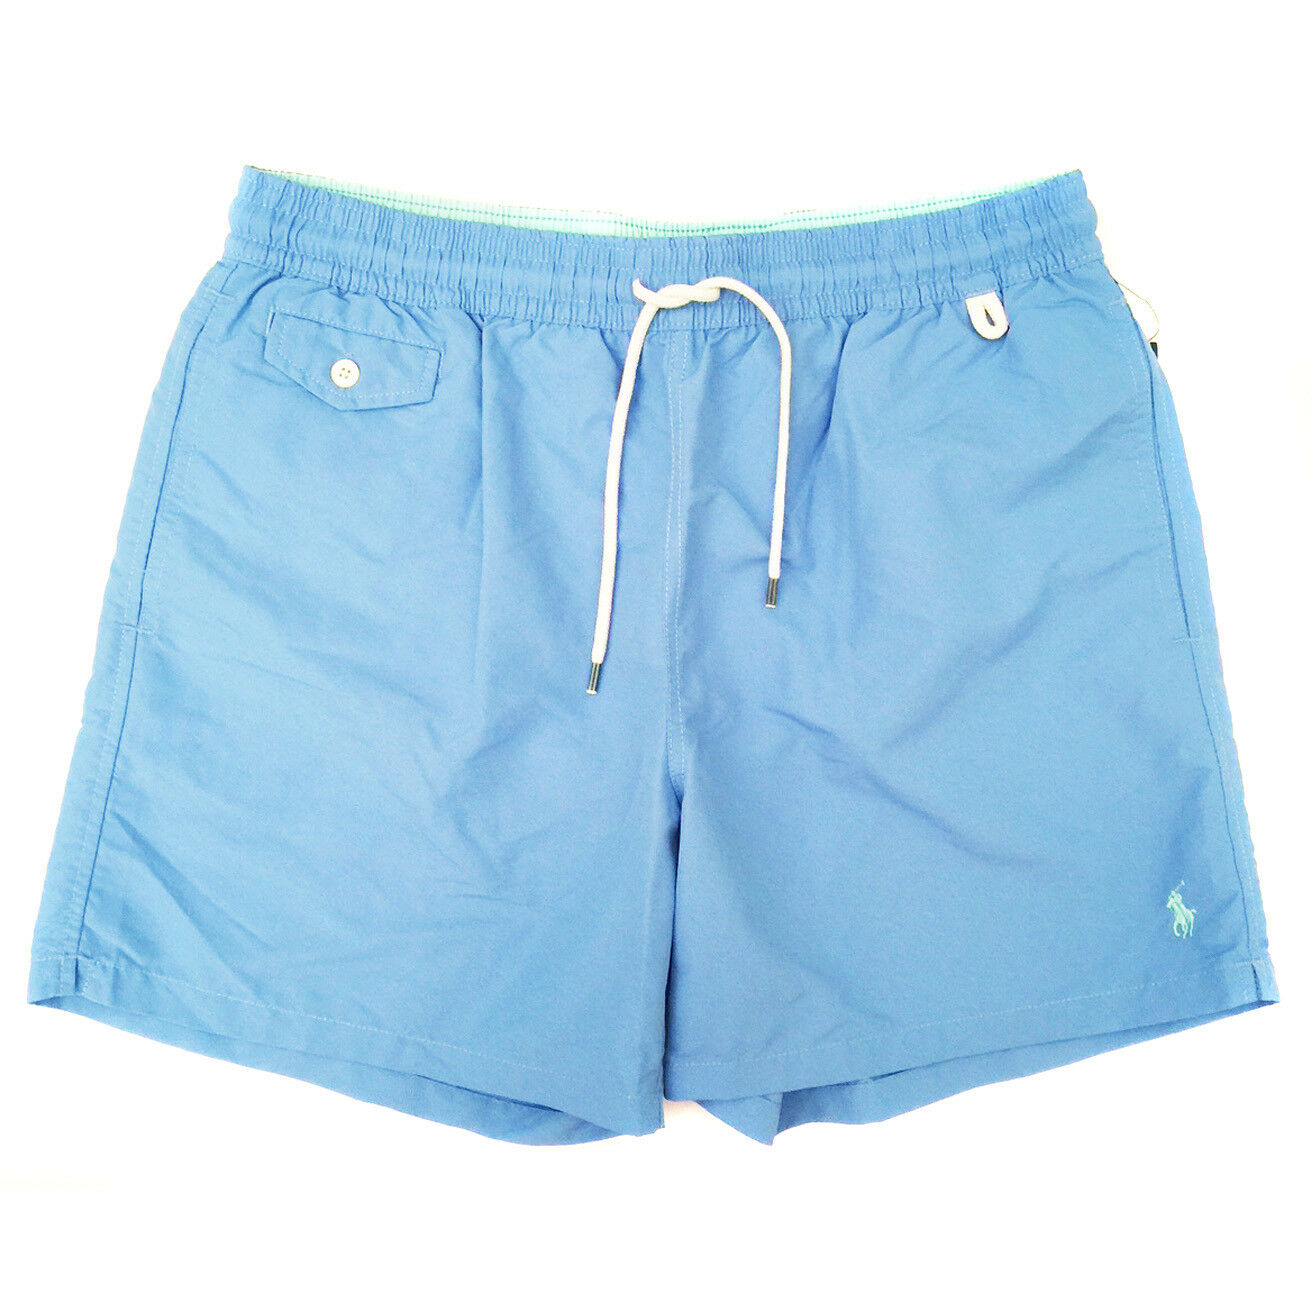 26979ba10f NEW Genuine LAUREN Light bluee Swimming Trunks Board Swim Shorts Mens XL  RALPH nowilc2097-Swimwear